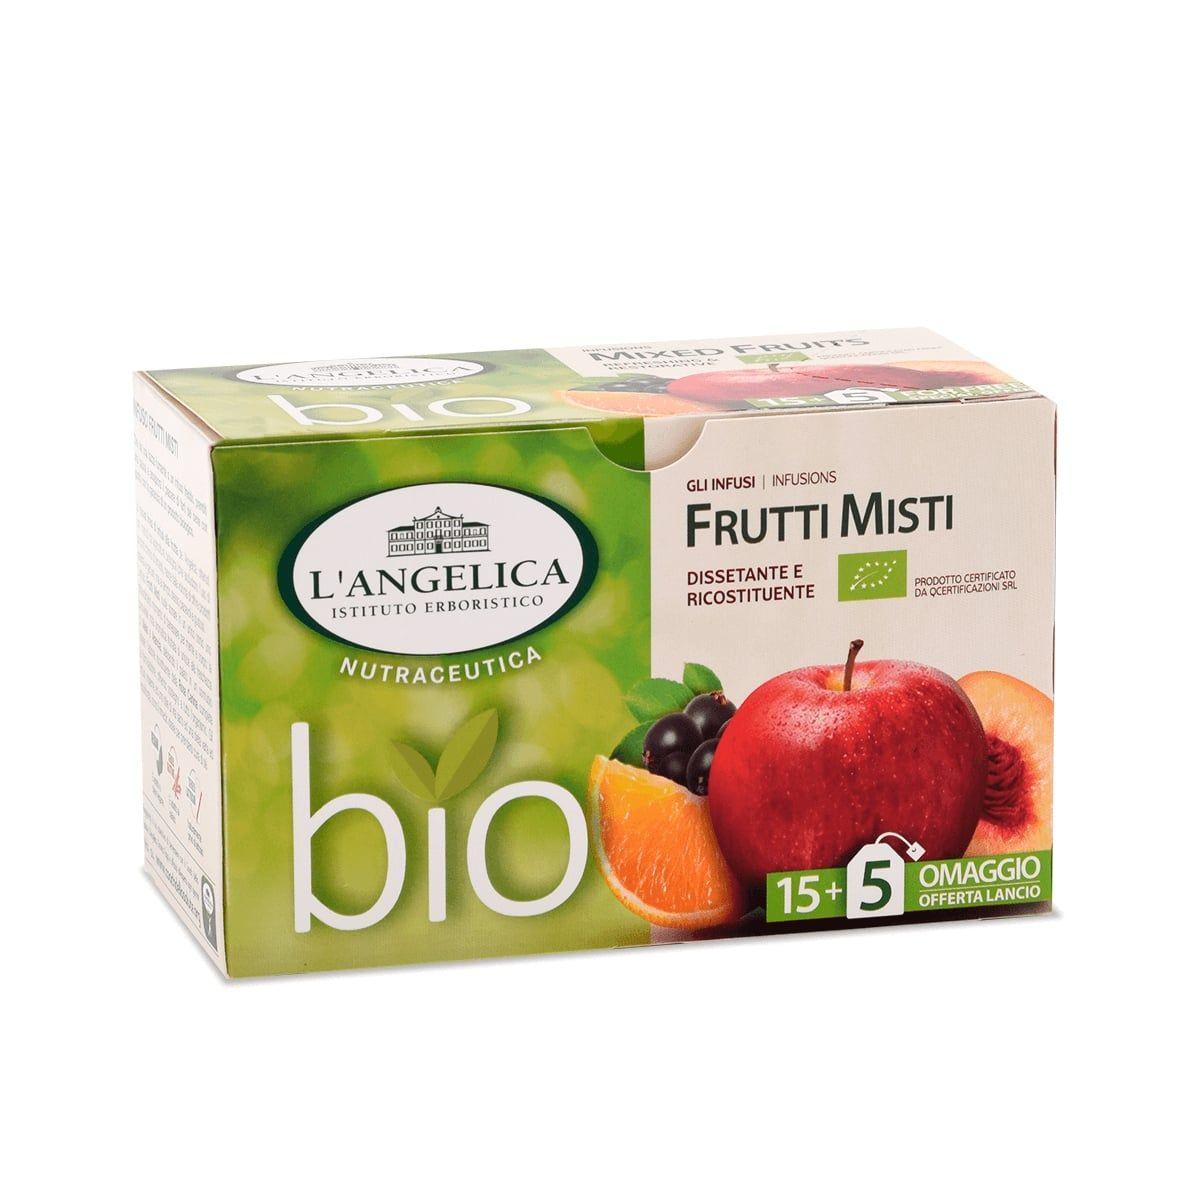 Infuso biologico ai Frutti Misti